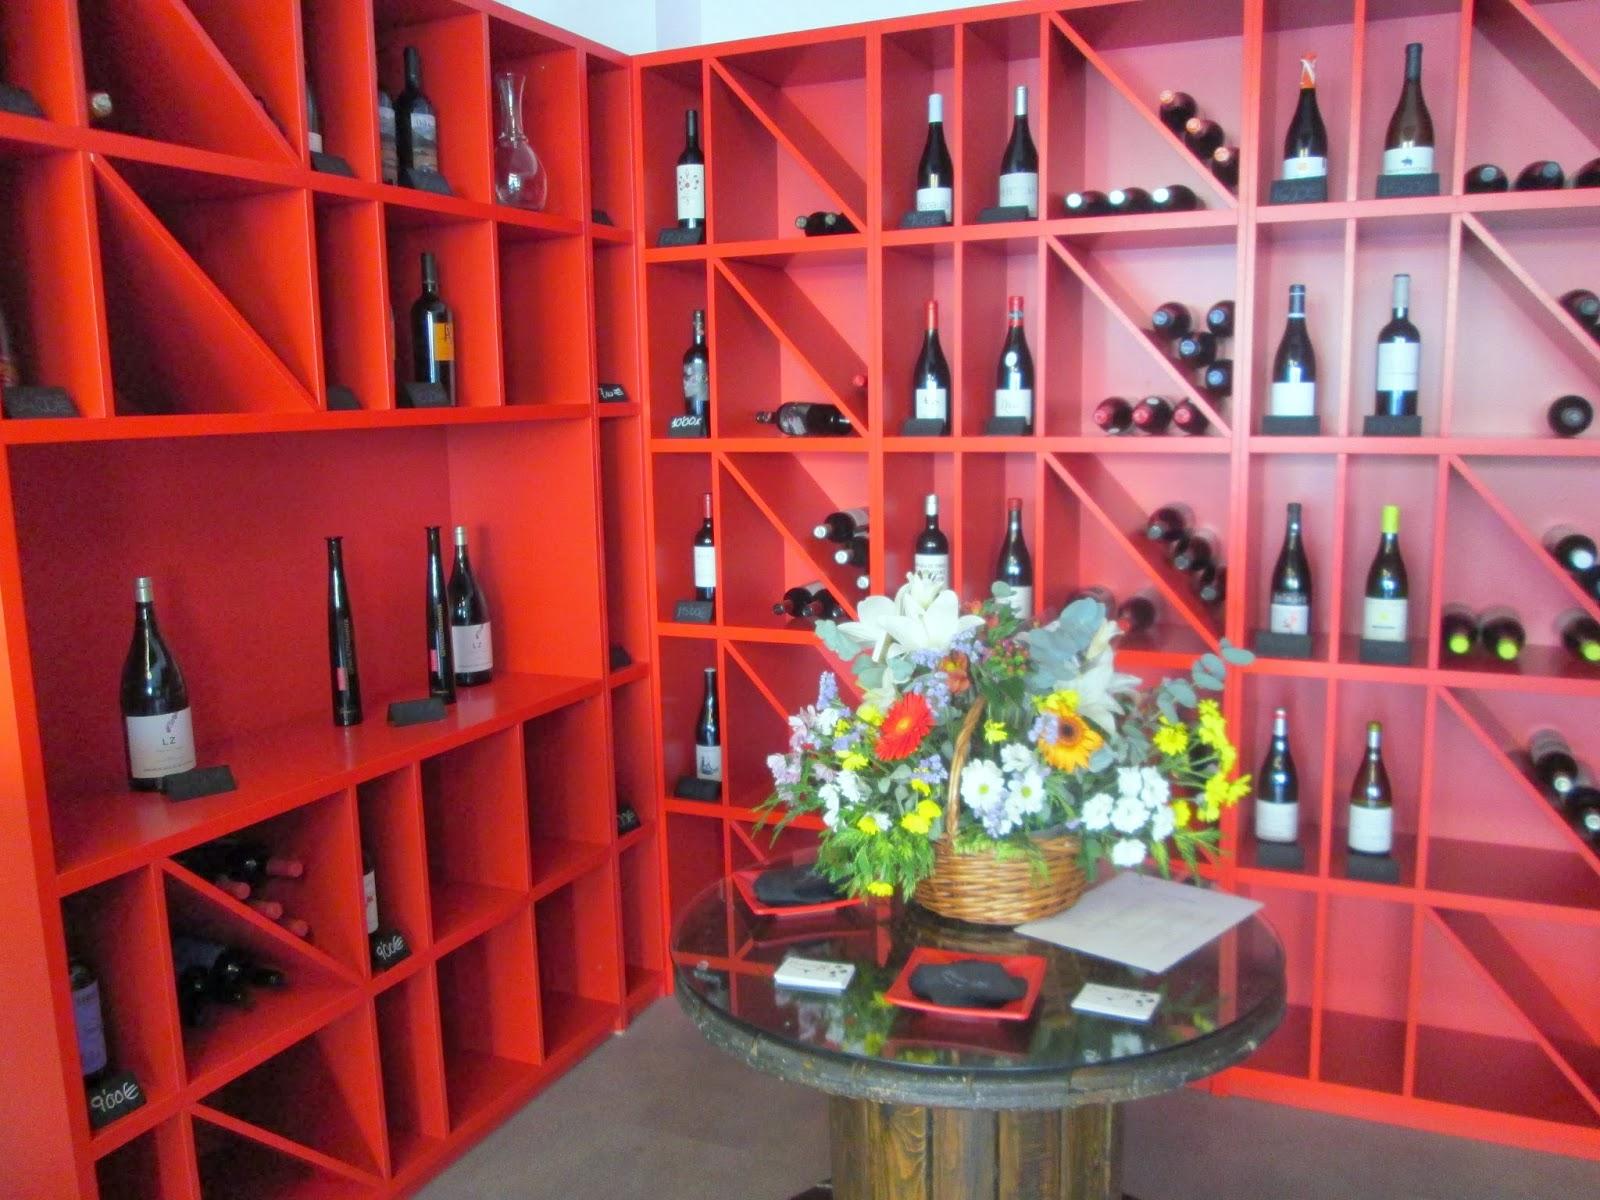 Vinoteca baladi disfruta de espa a gourmet gastronomy travel taste spain - Como montar una vinoteca ...